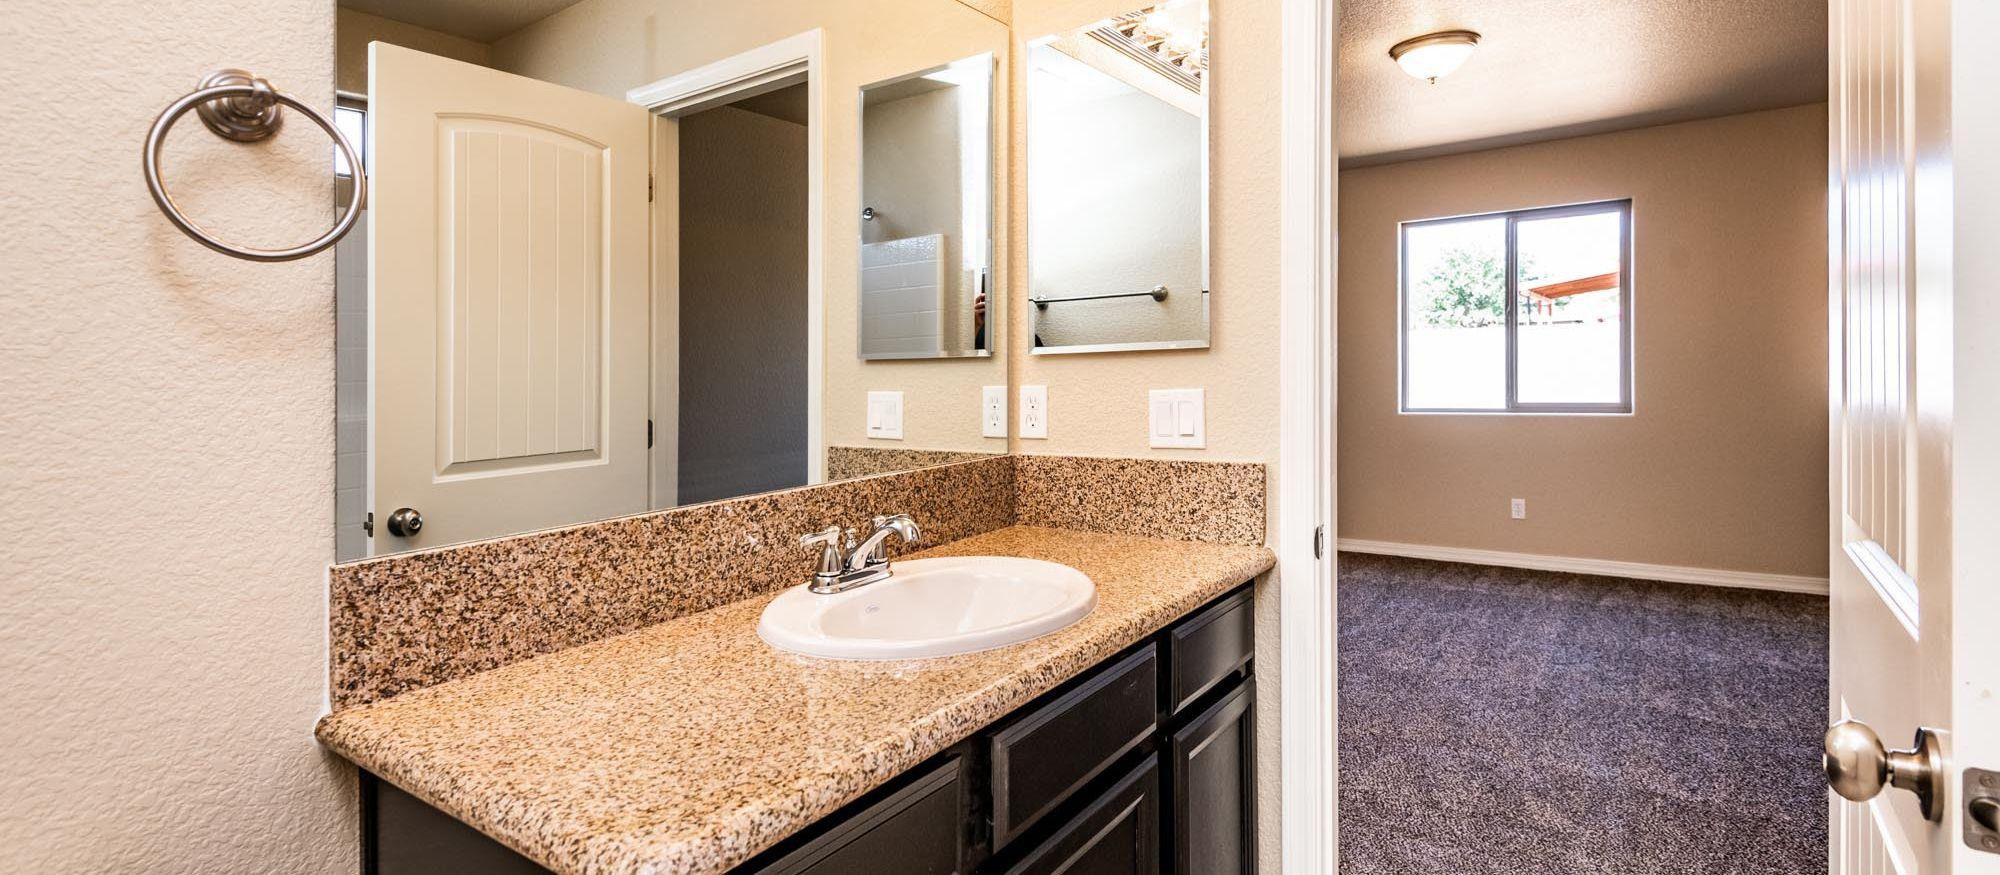 Bathroom featured in the Juniper Junior 1205 By Angle Homes in Kingman-Lake Havasu City, AZ